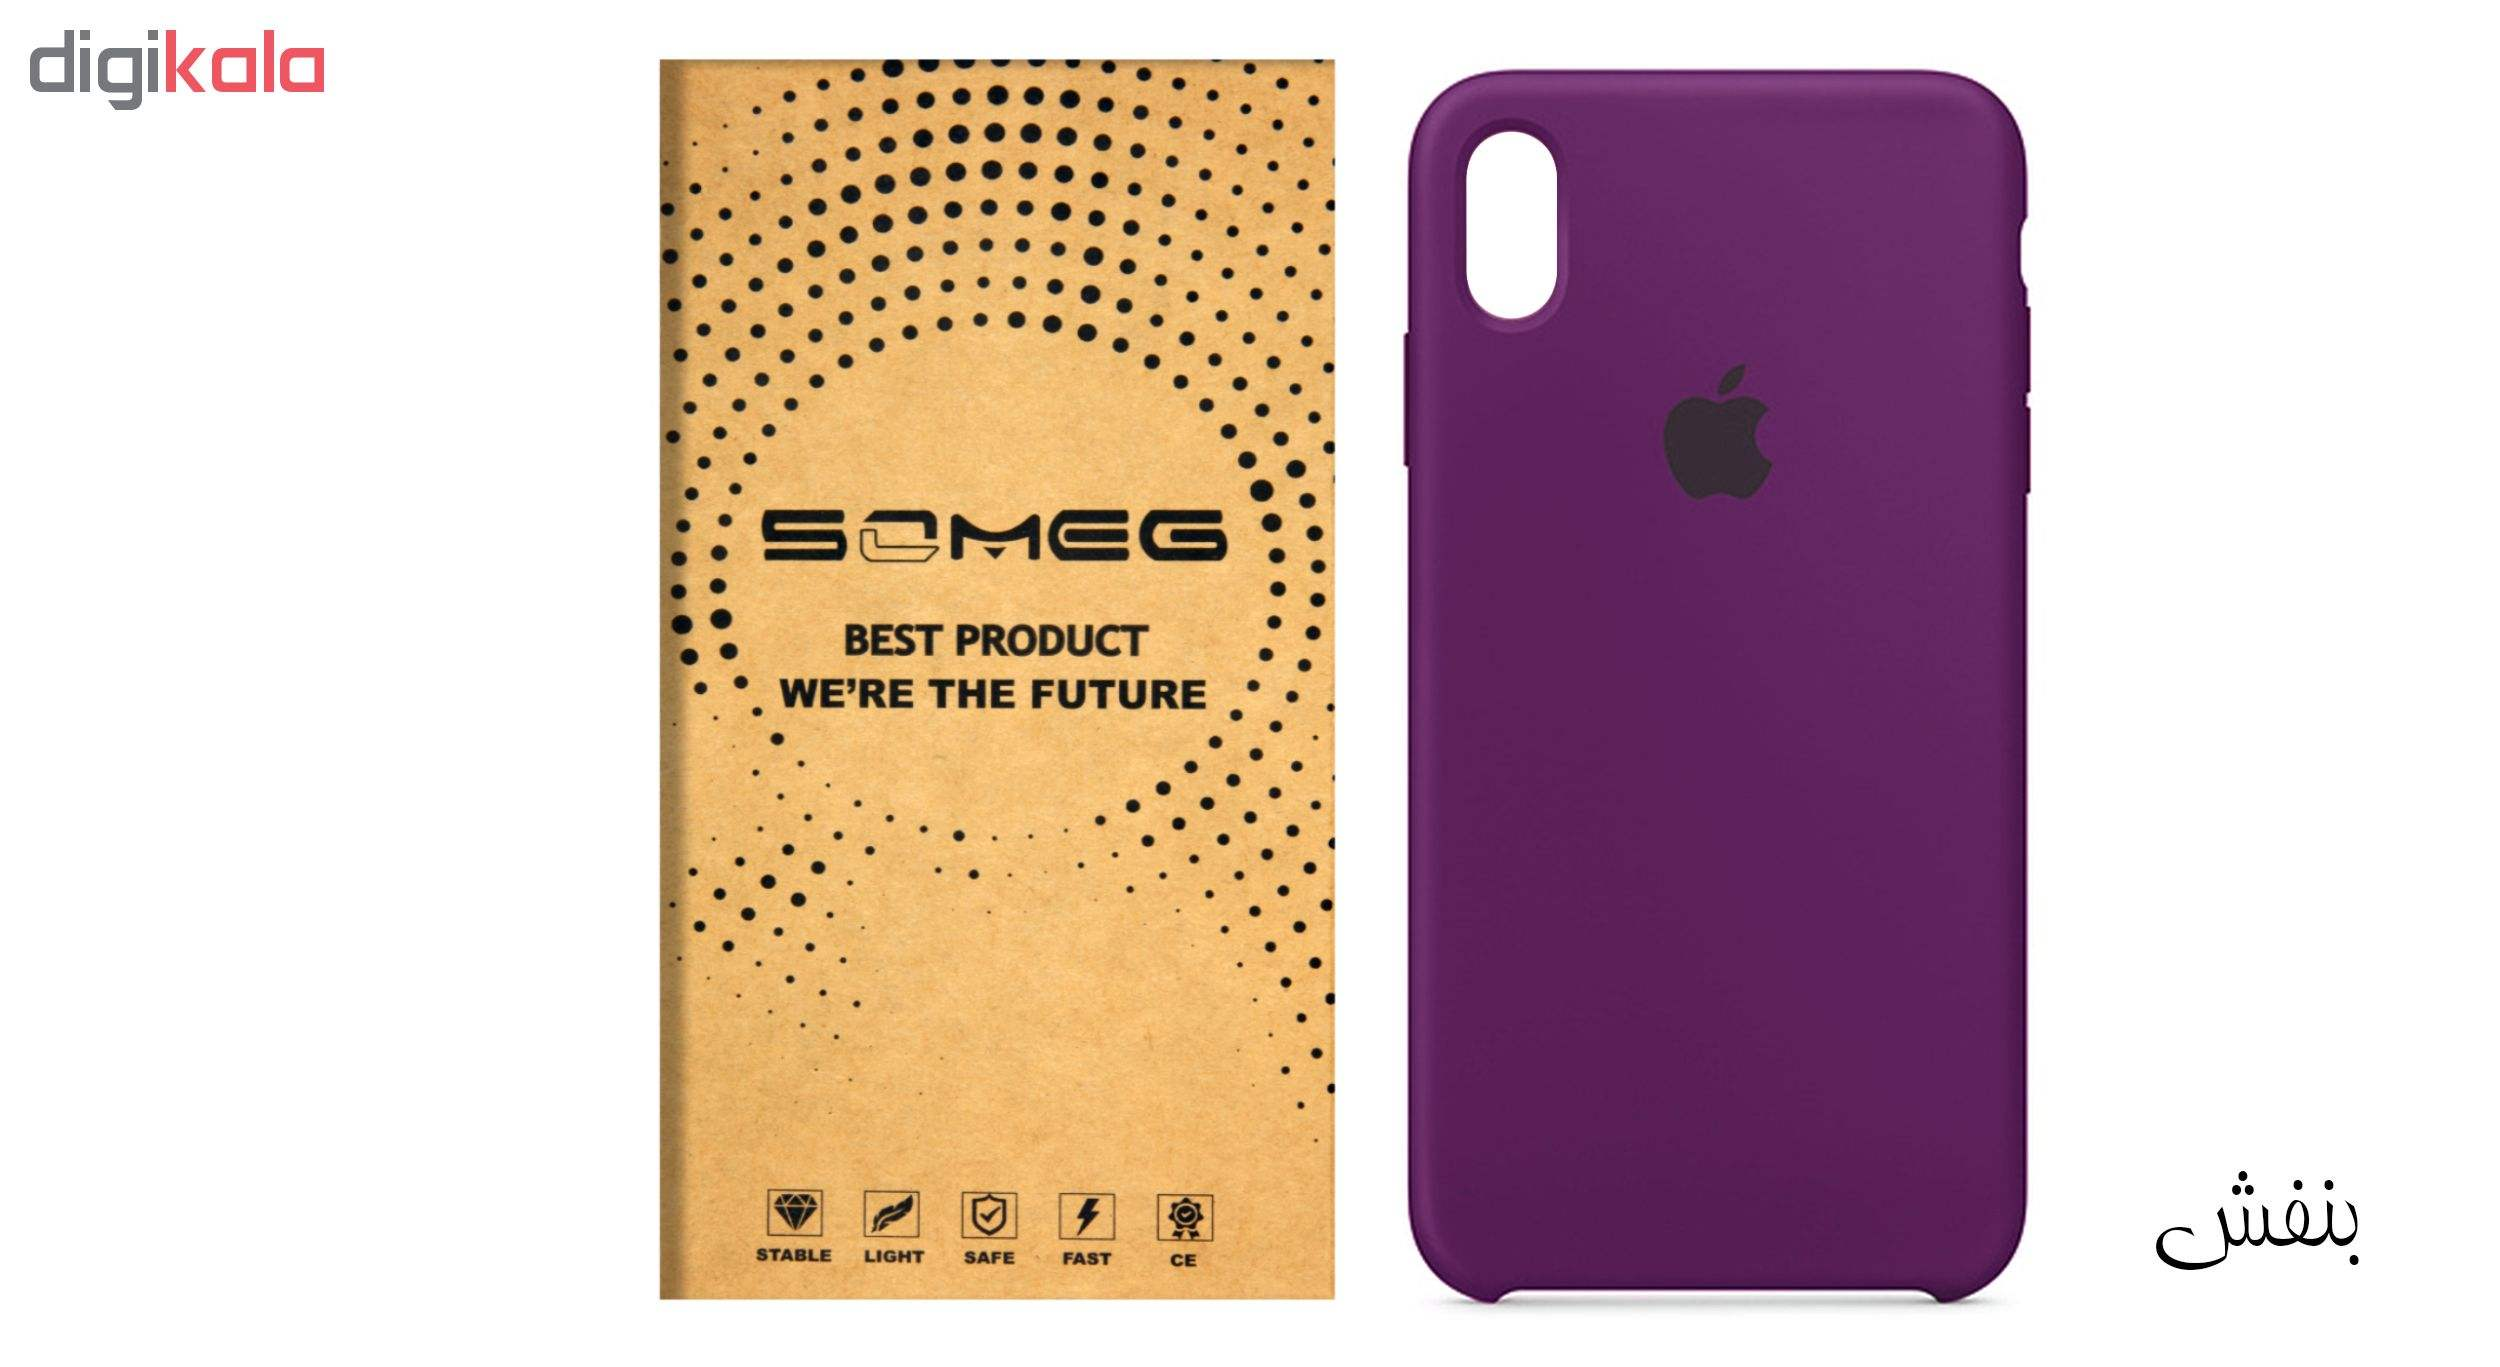 کاور سومگ مدل SIC مناسب برای گوشی موبایل اپل iPhone X  main 1 15